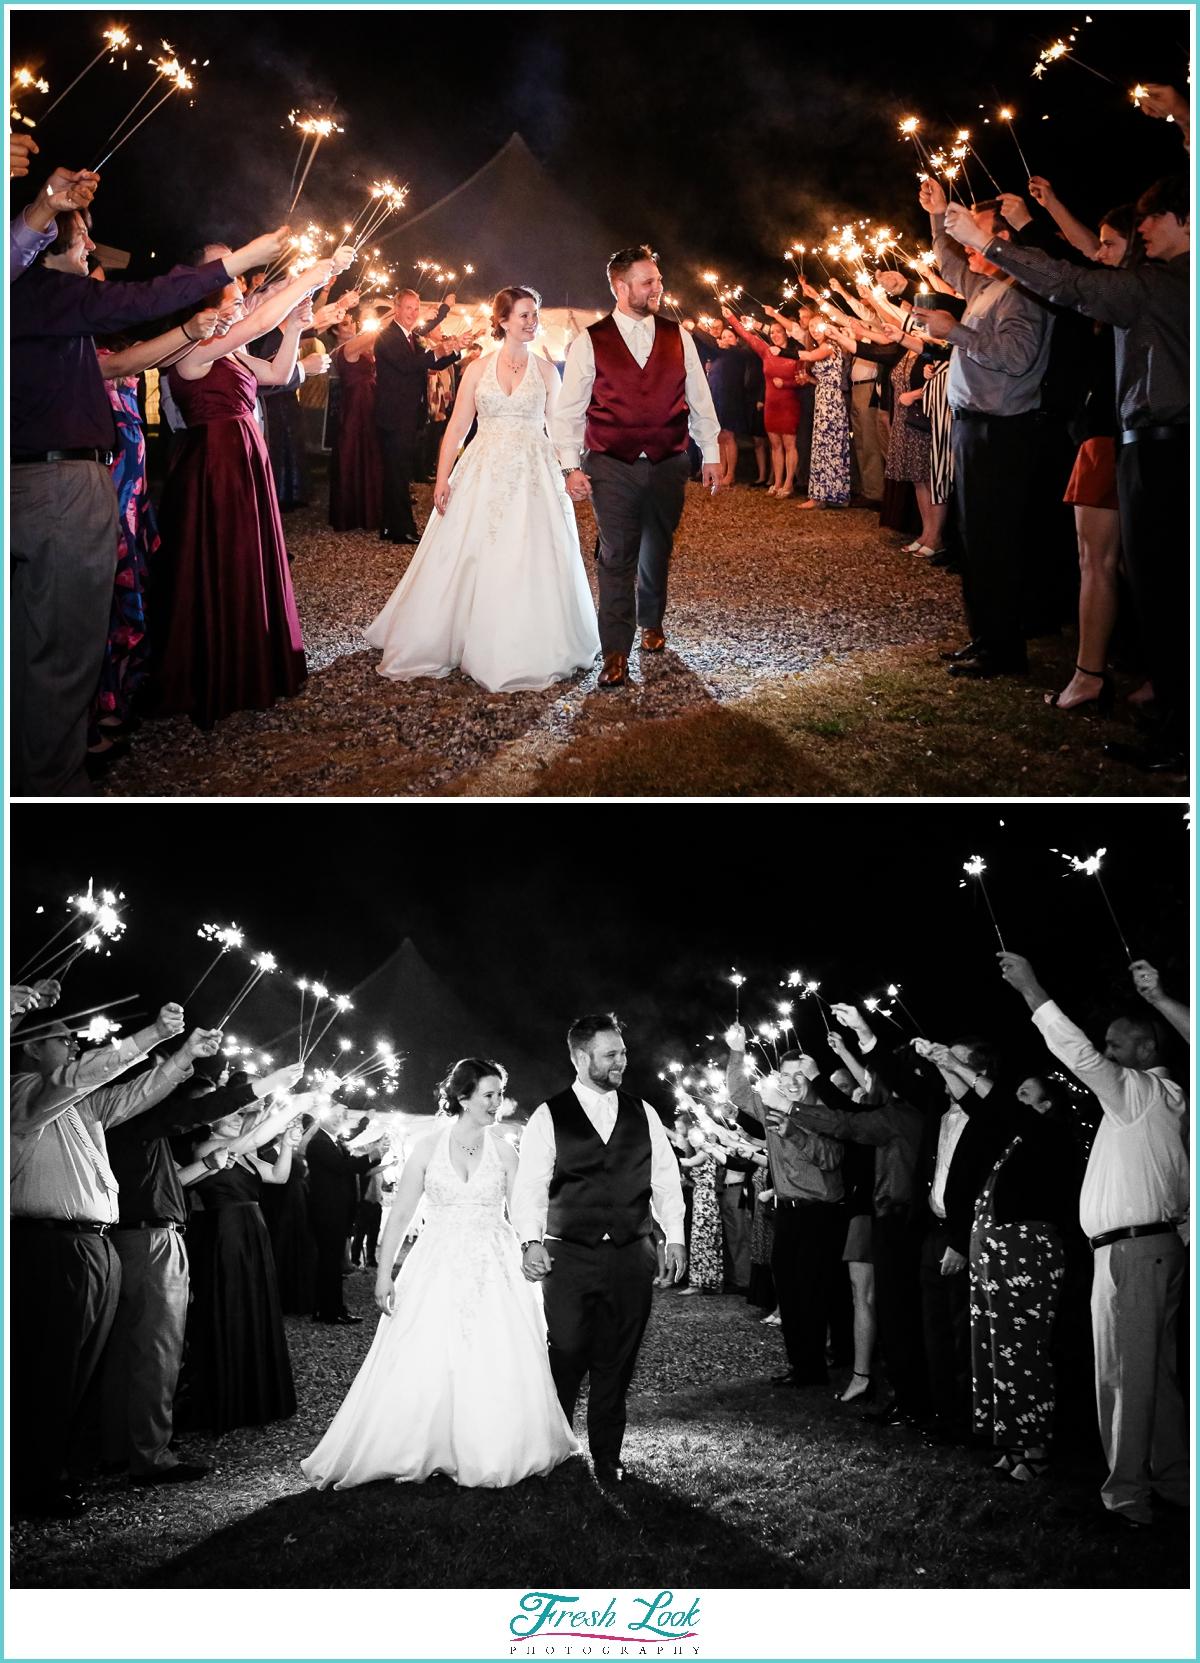 sparkler sendoff at wedding reception